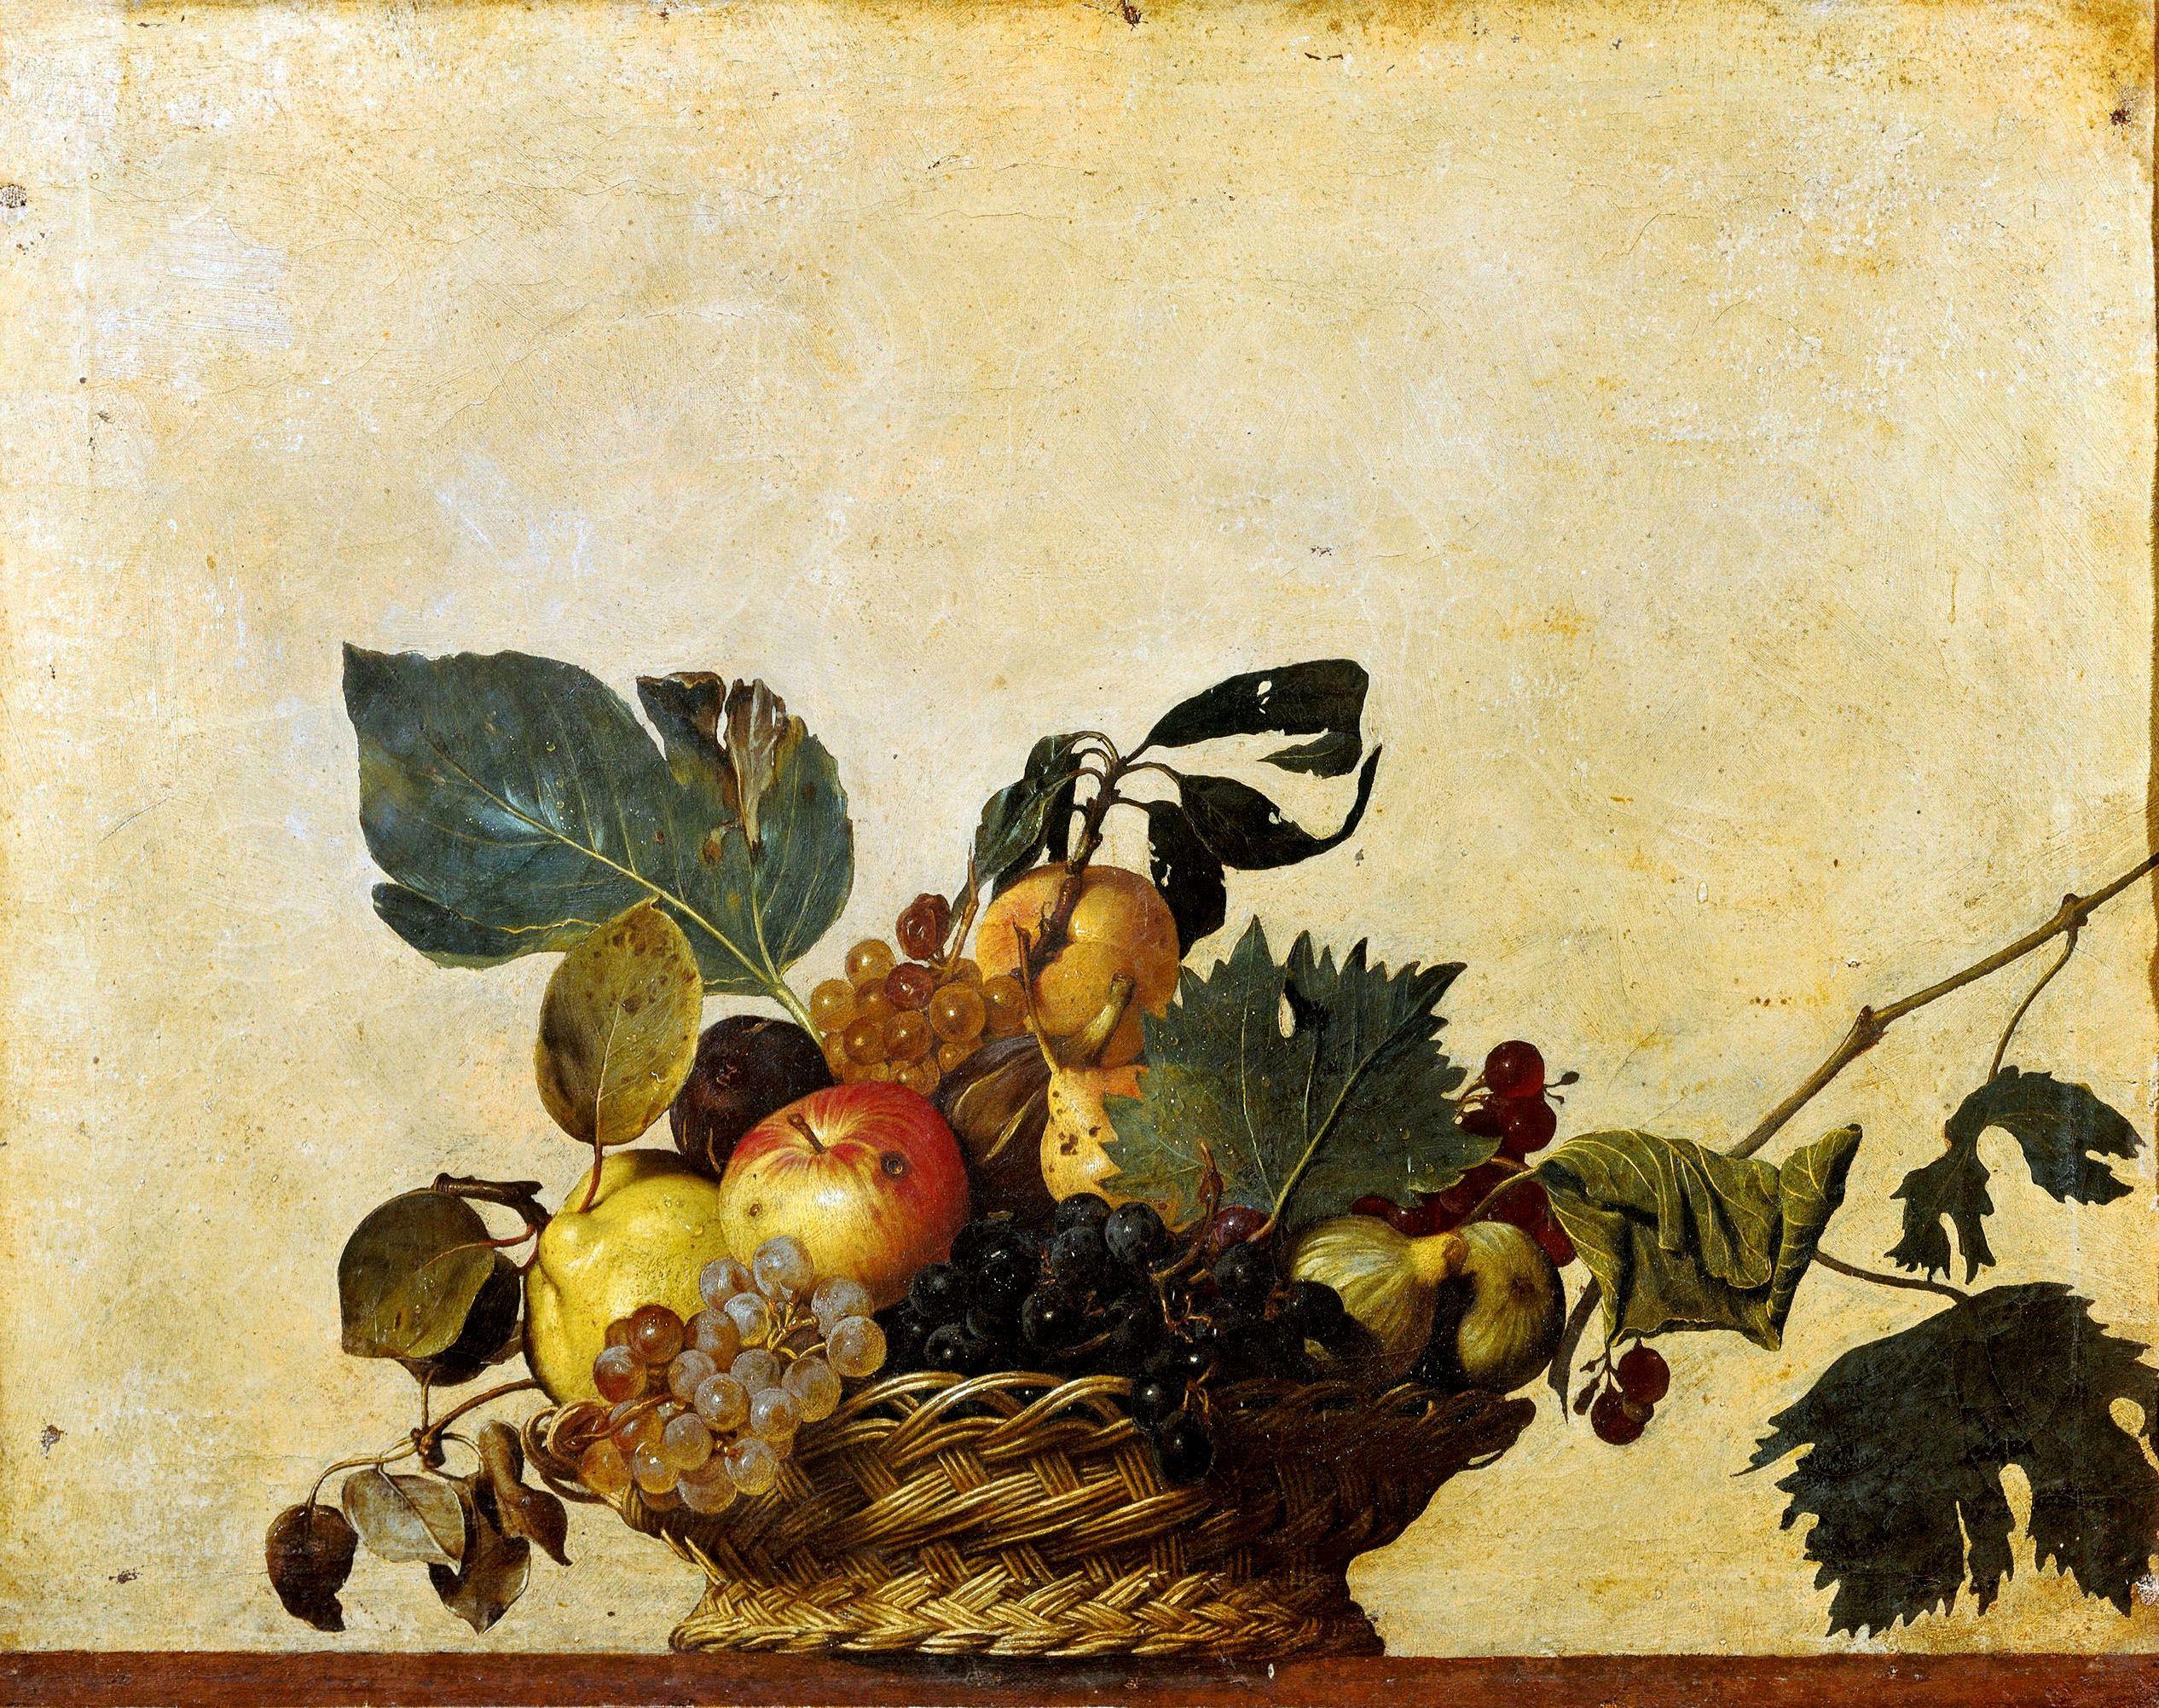 Basket of Fruit, c.1596 - Caravaggio - WikiArt.org